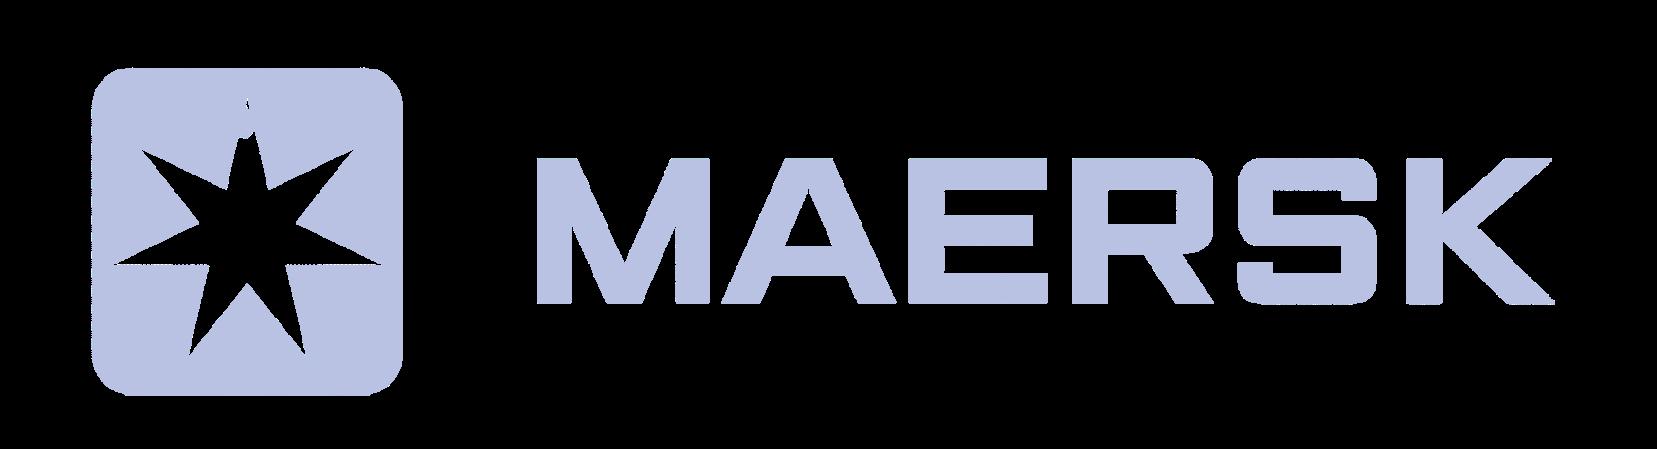 Maersk_hero-1